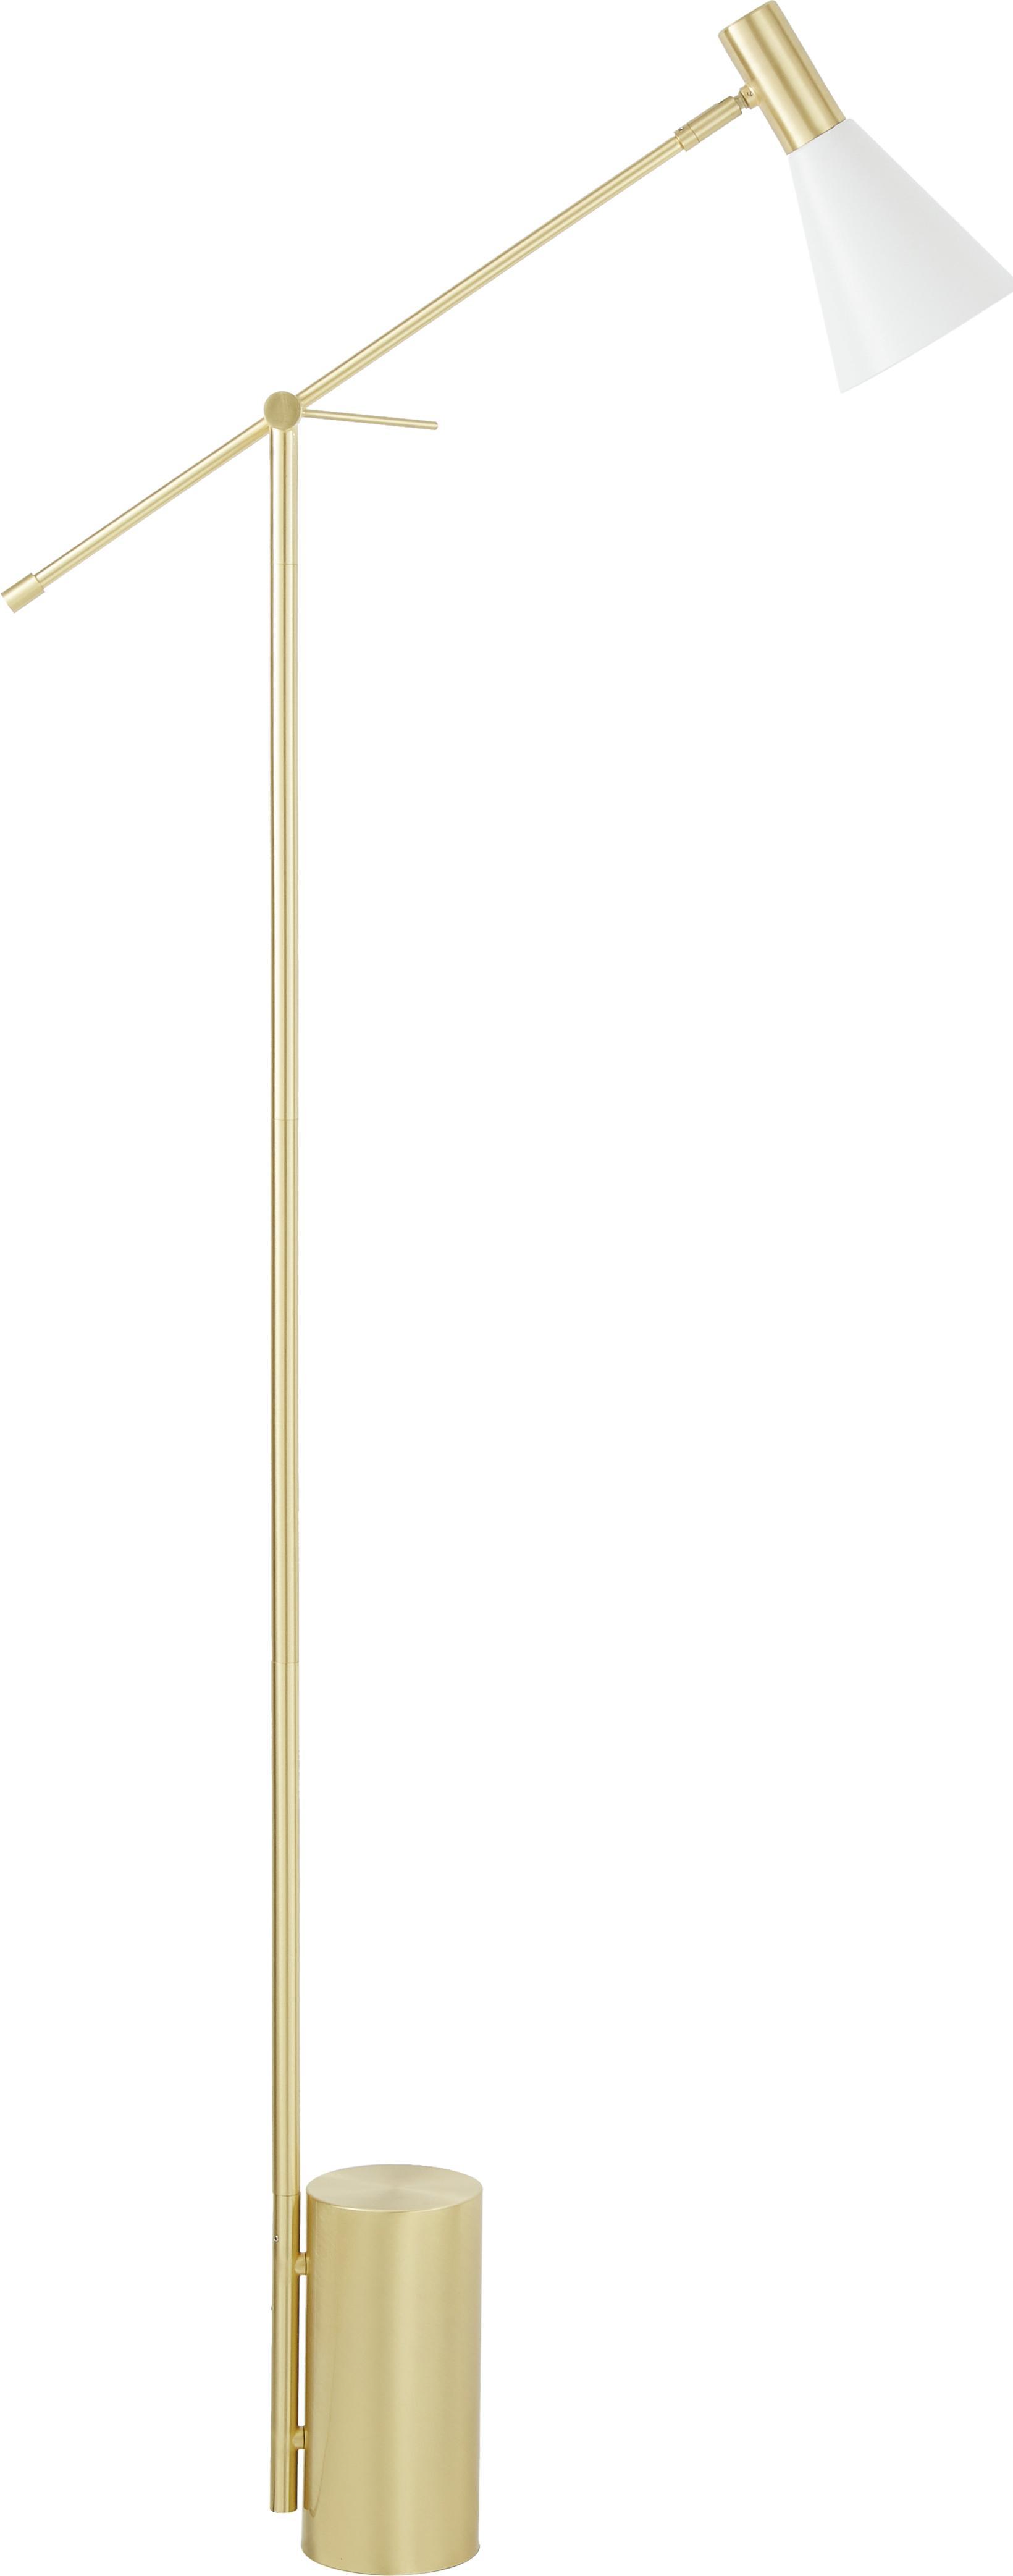 Retro-Leselampe Sia in Weiß-Gold, Lampenschirm: Metall, pulverbeschichtet, Lampenfuß: Metall, vermessingt, Weiß, Messingfarben, Ø 14 x H 162 cm